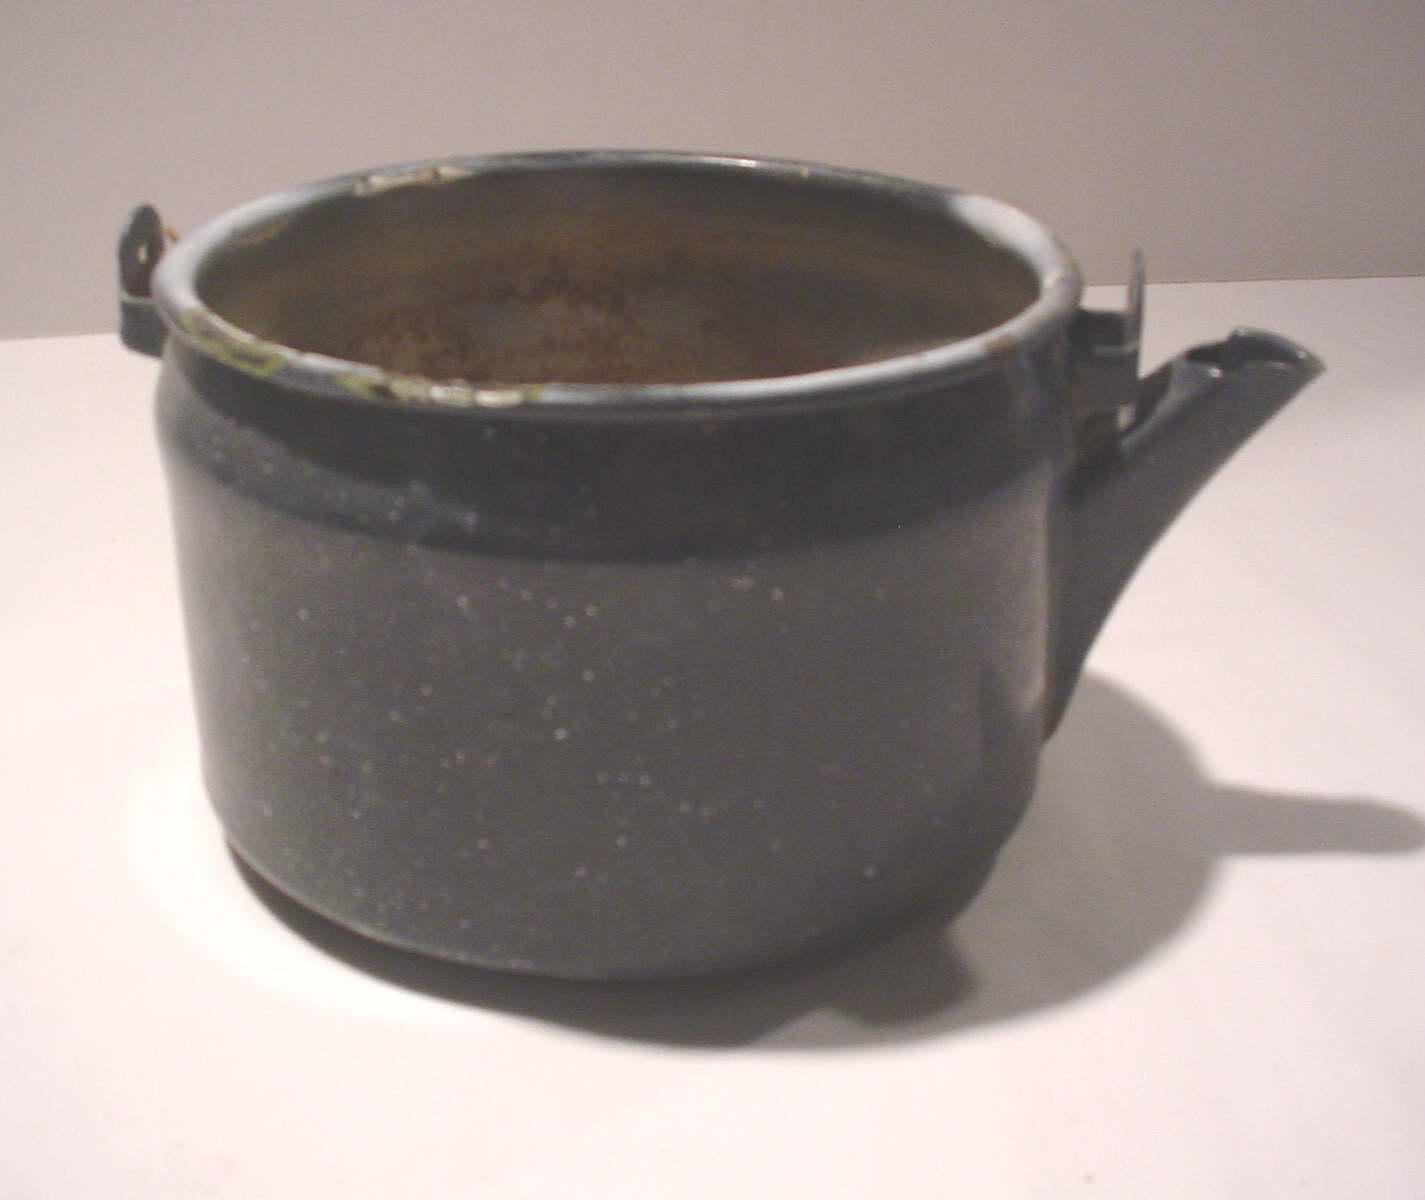 High Plains Museum | HHG343 Dark blue and white granite teakettle